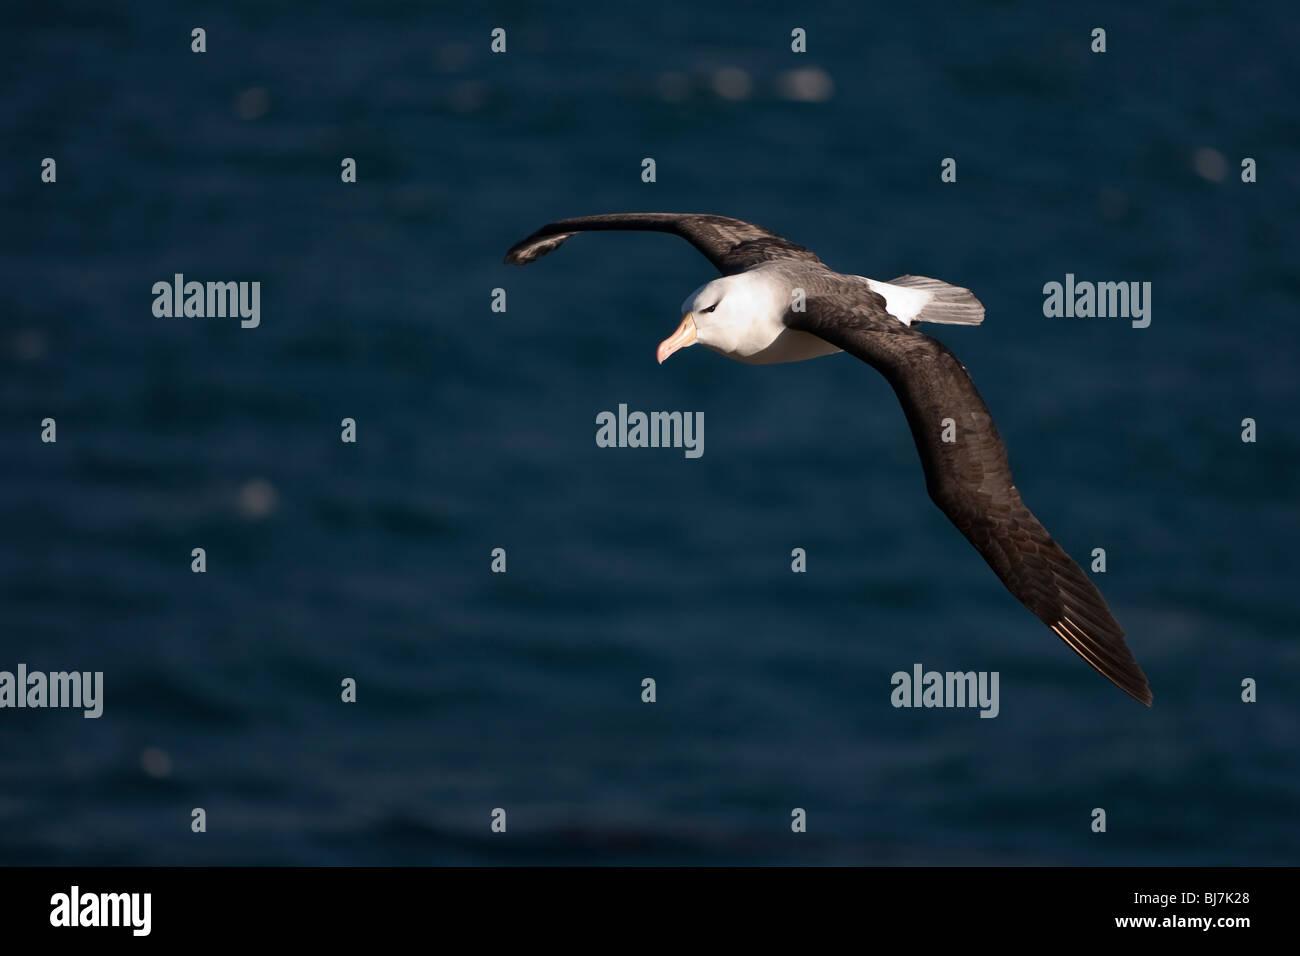 Black-browed Albatross Thalassarche melanophrys Schwarzbrauenalbatros Mollymawk Saunders Island Falkland Islands - Stock Image